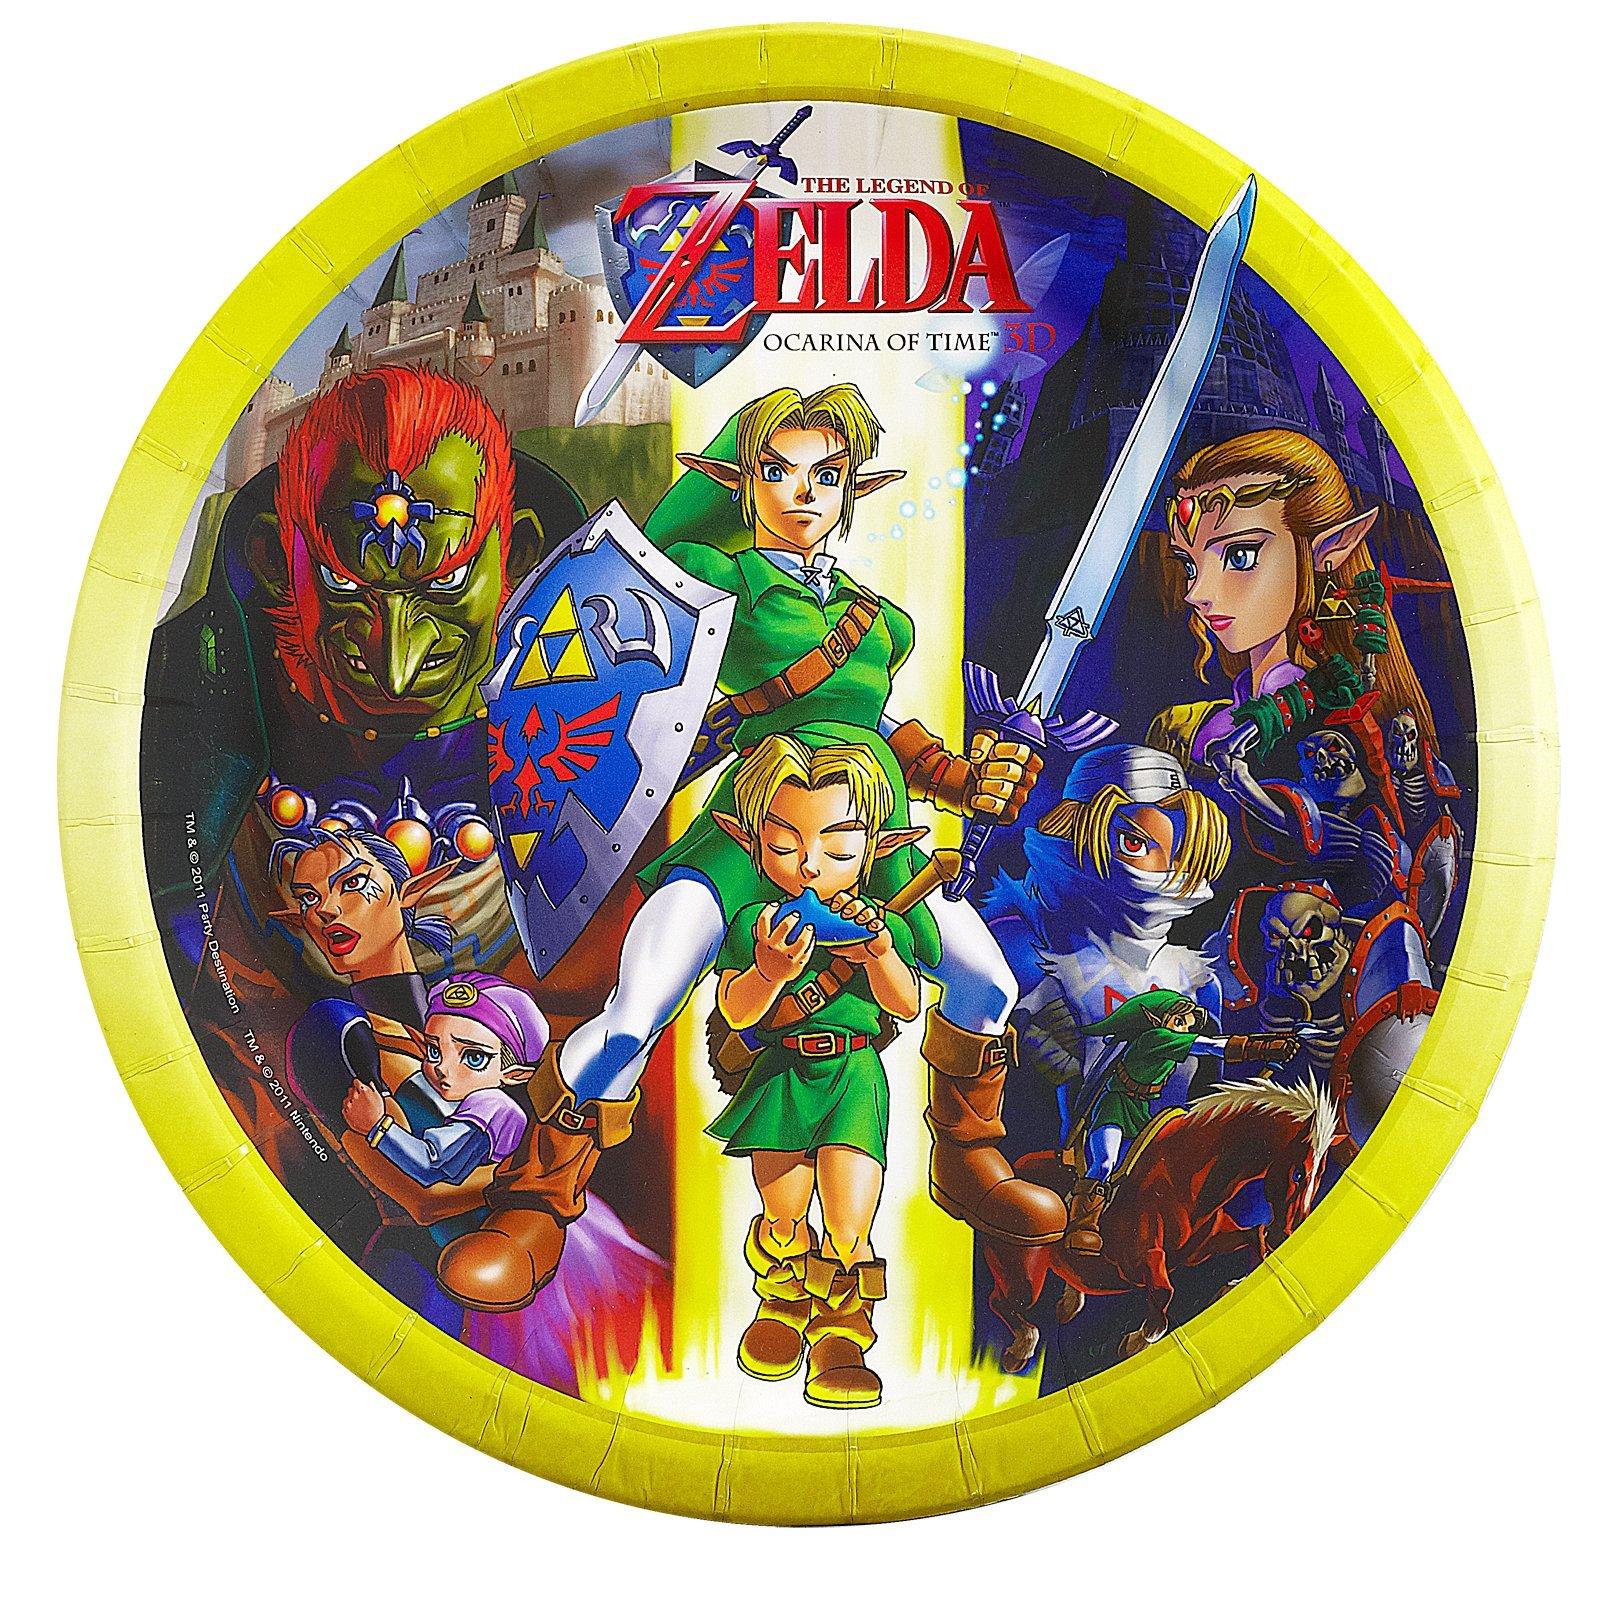 The Legend of Zelda Dinner Plates (8)